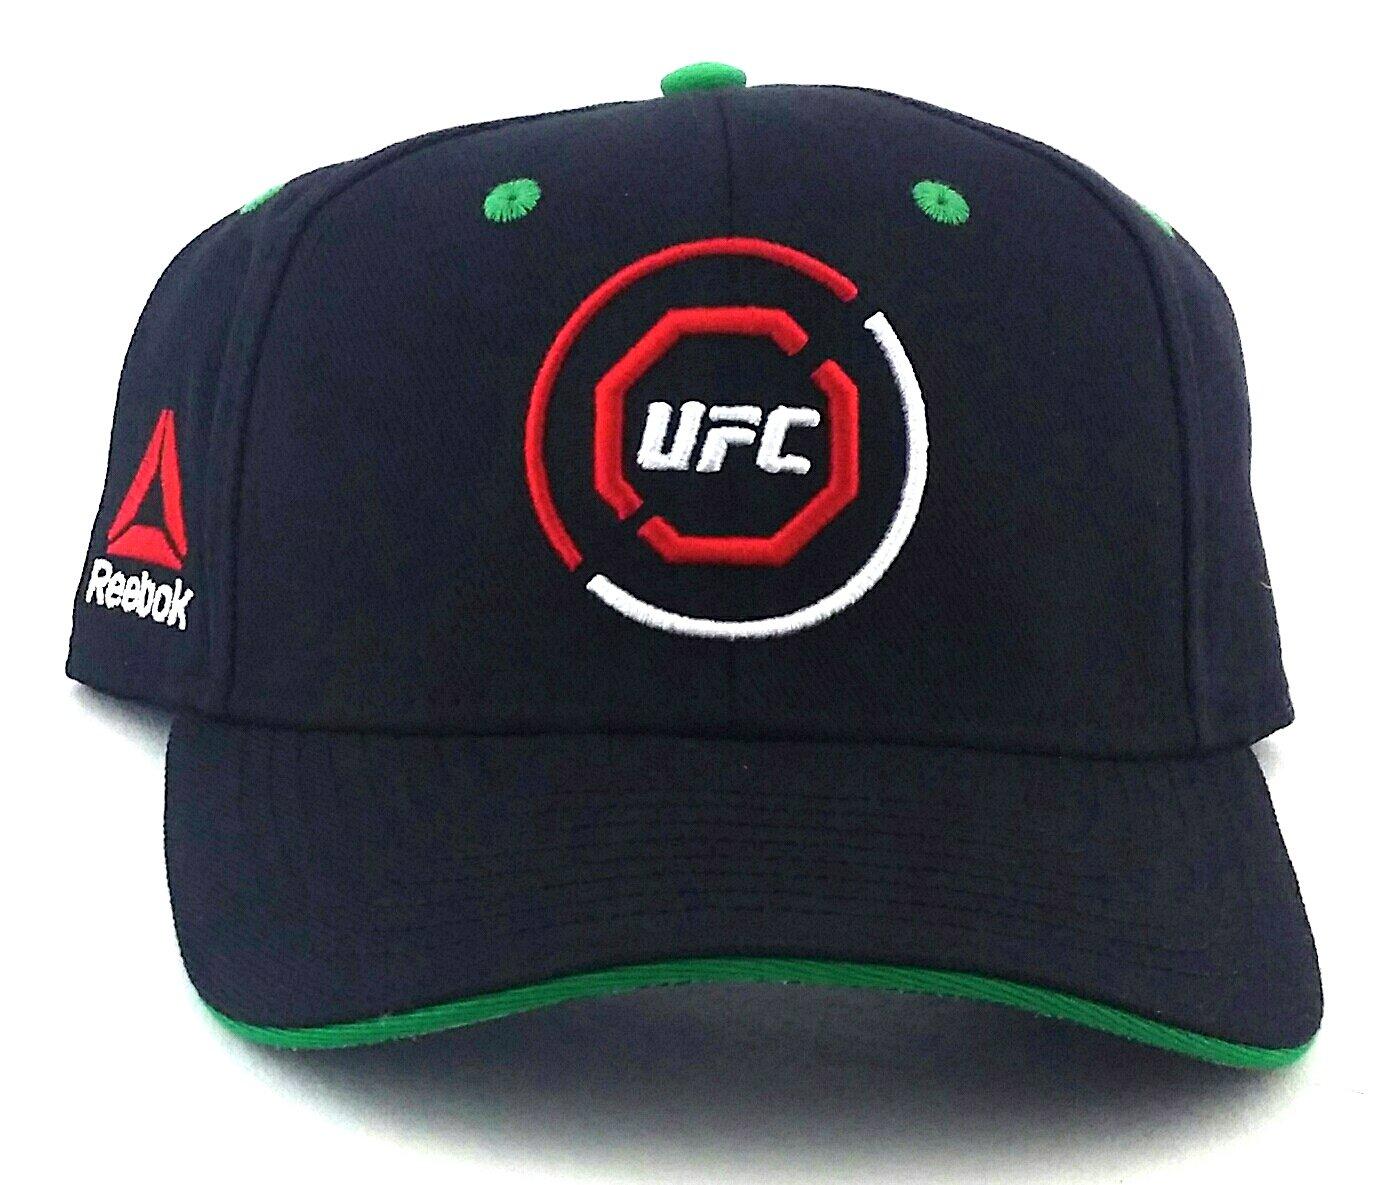 50381b2545899 Amazon.com : UFC Reebok RBK MMA Black Red Green Octagon Fighters ...